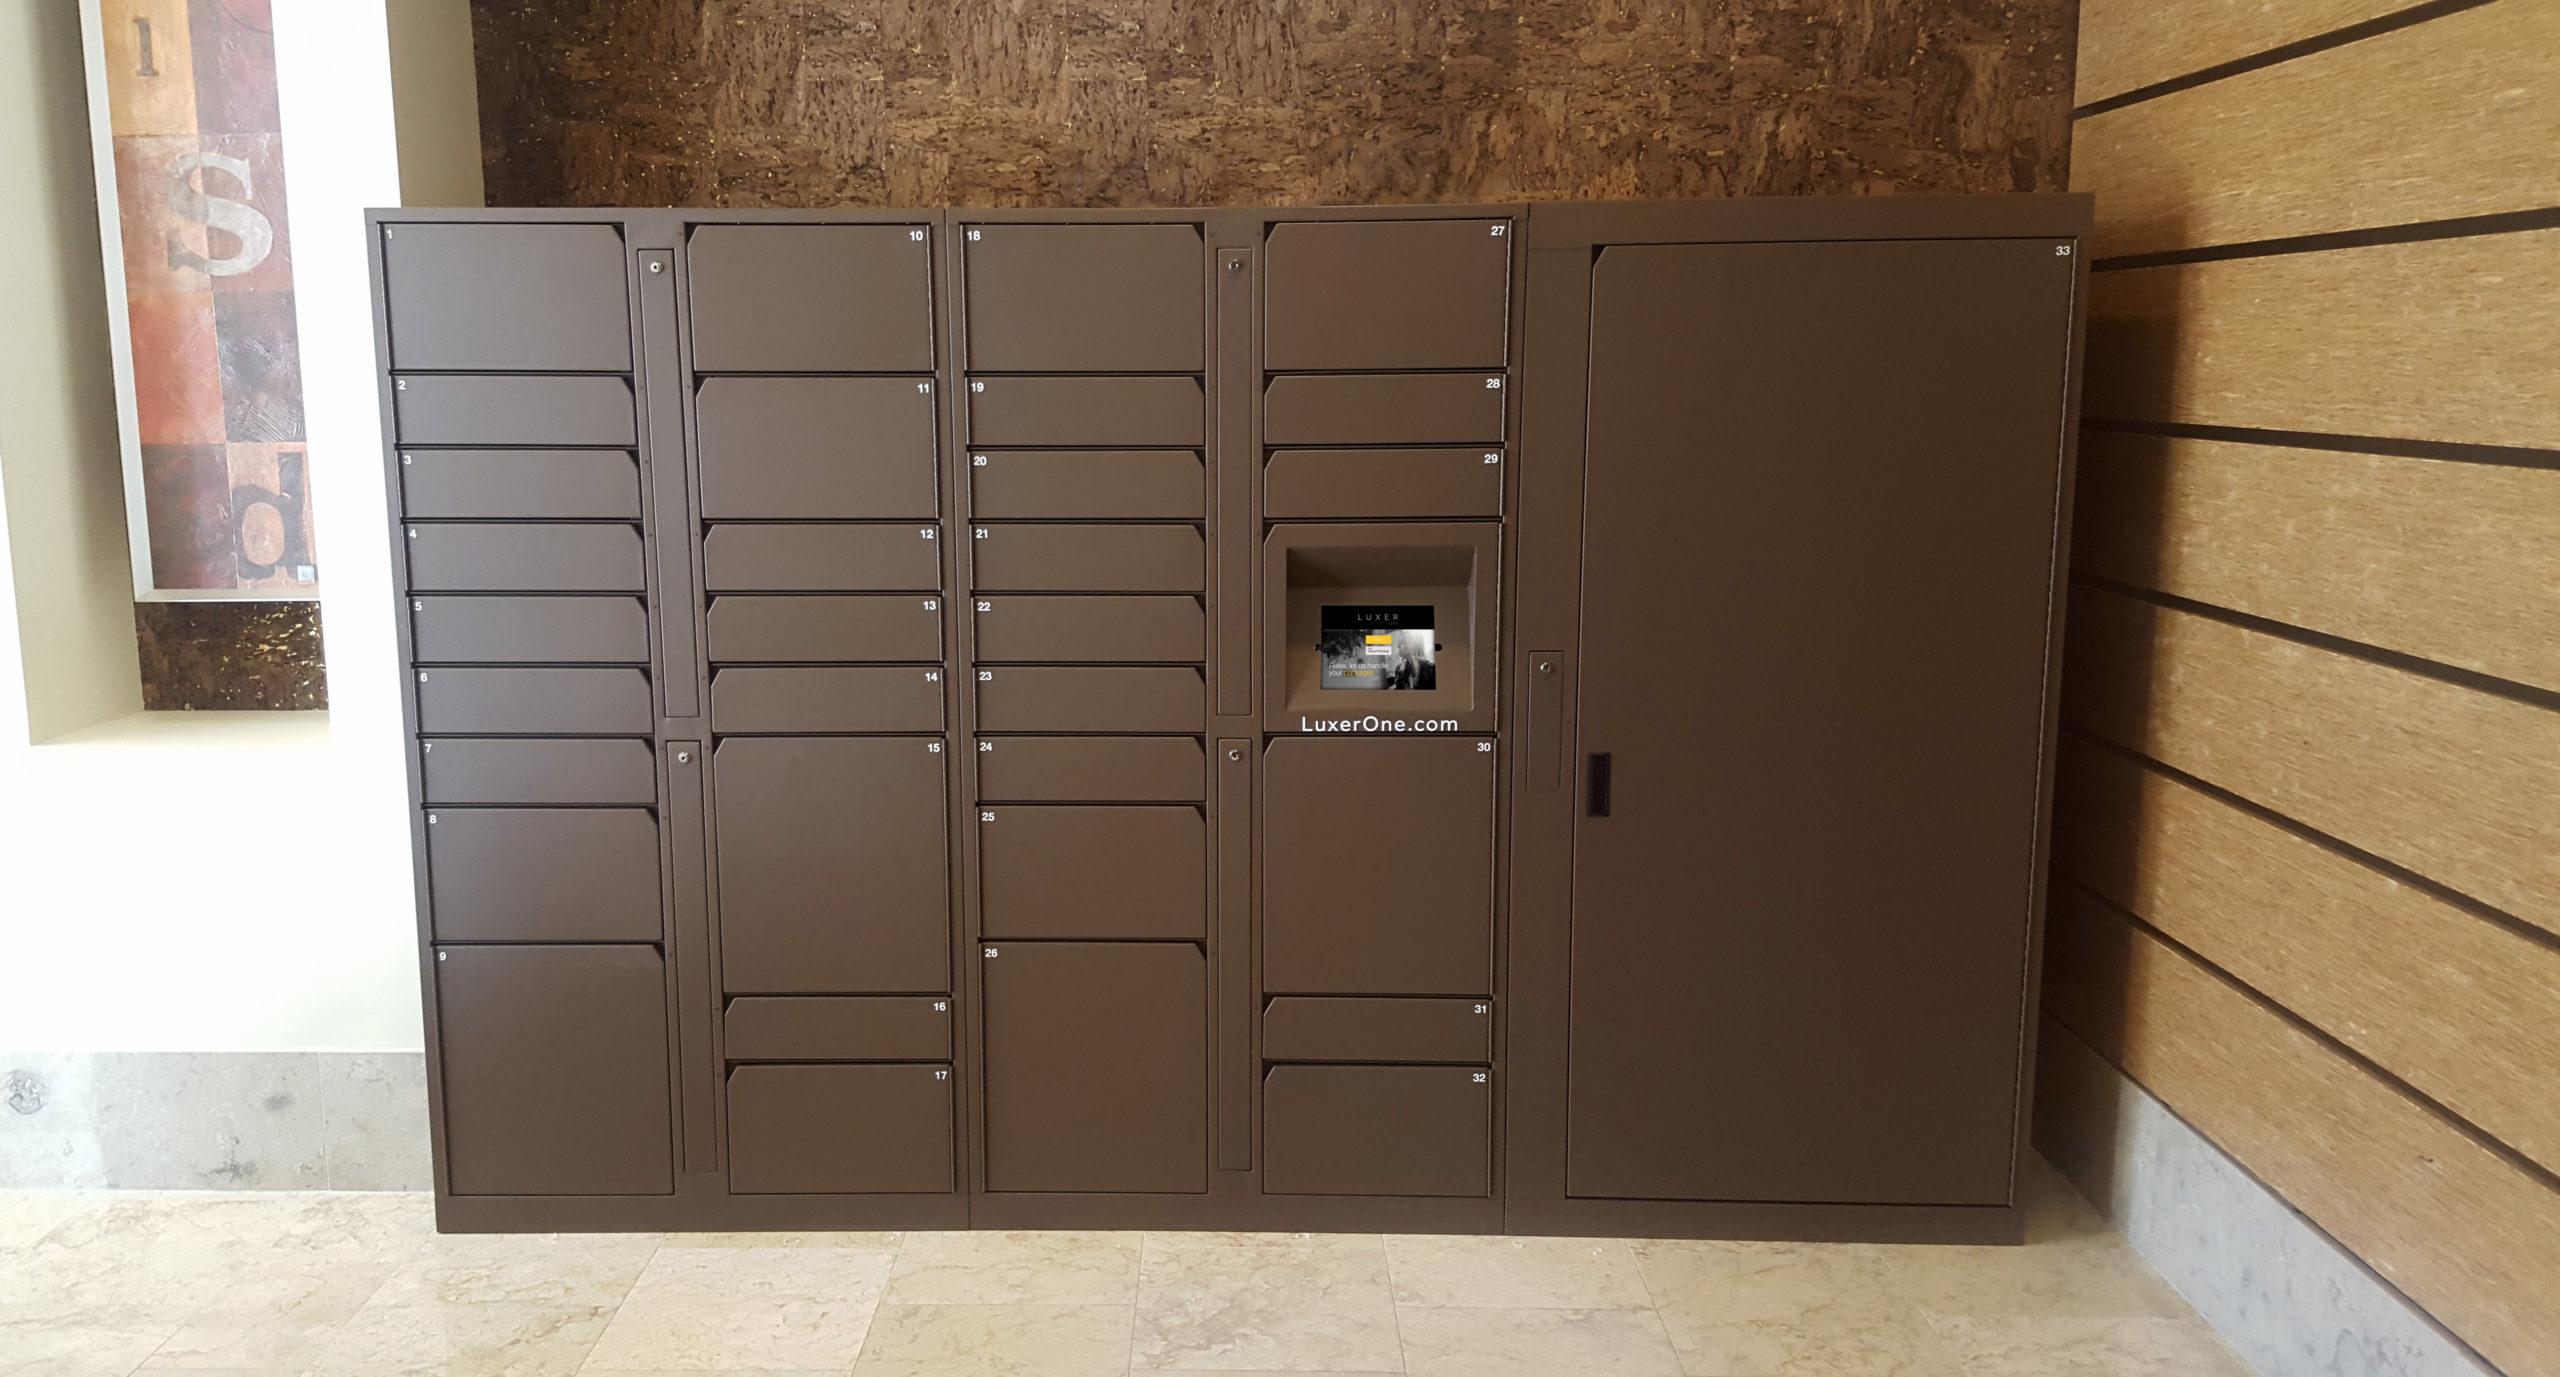 Brown Indoor Parcel Lockers from Luxer One